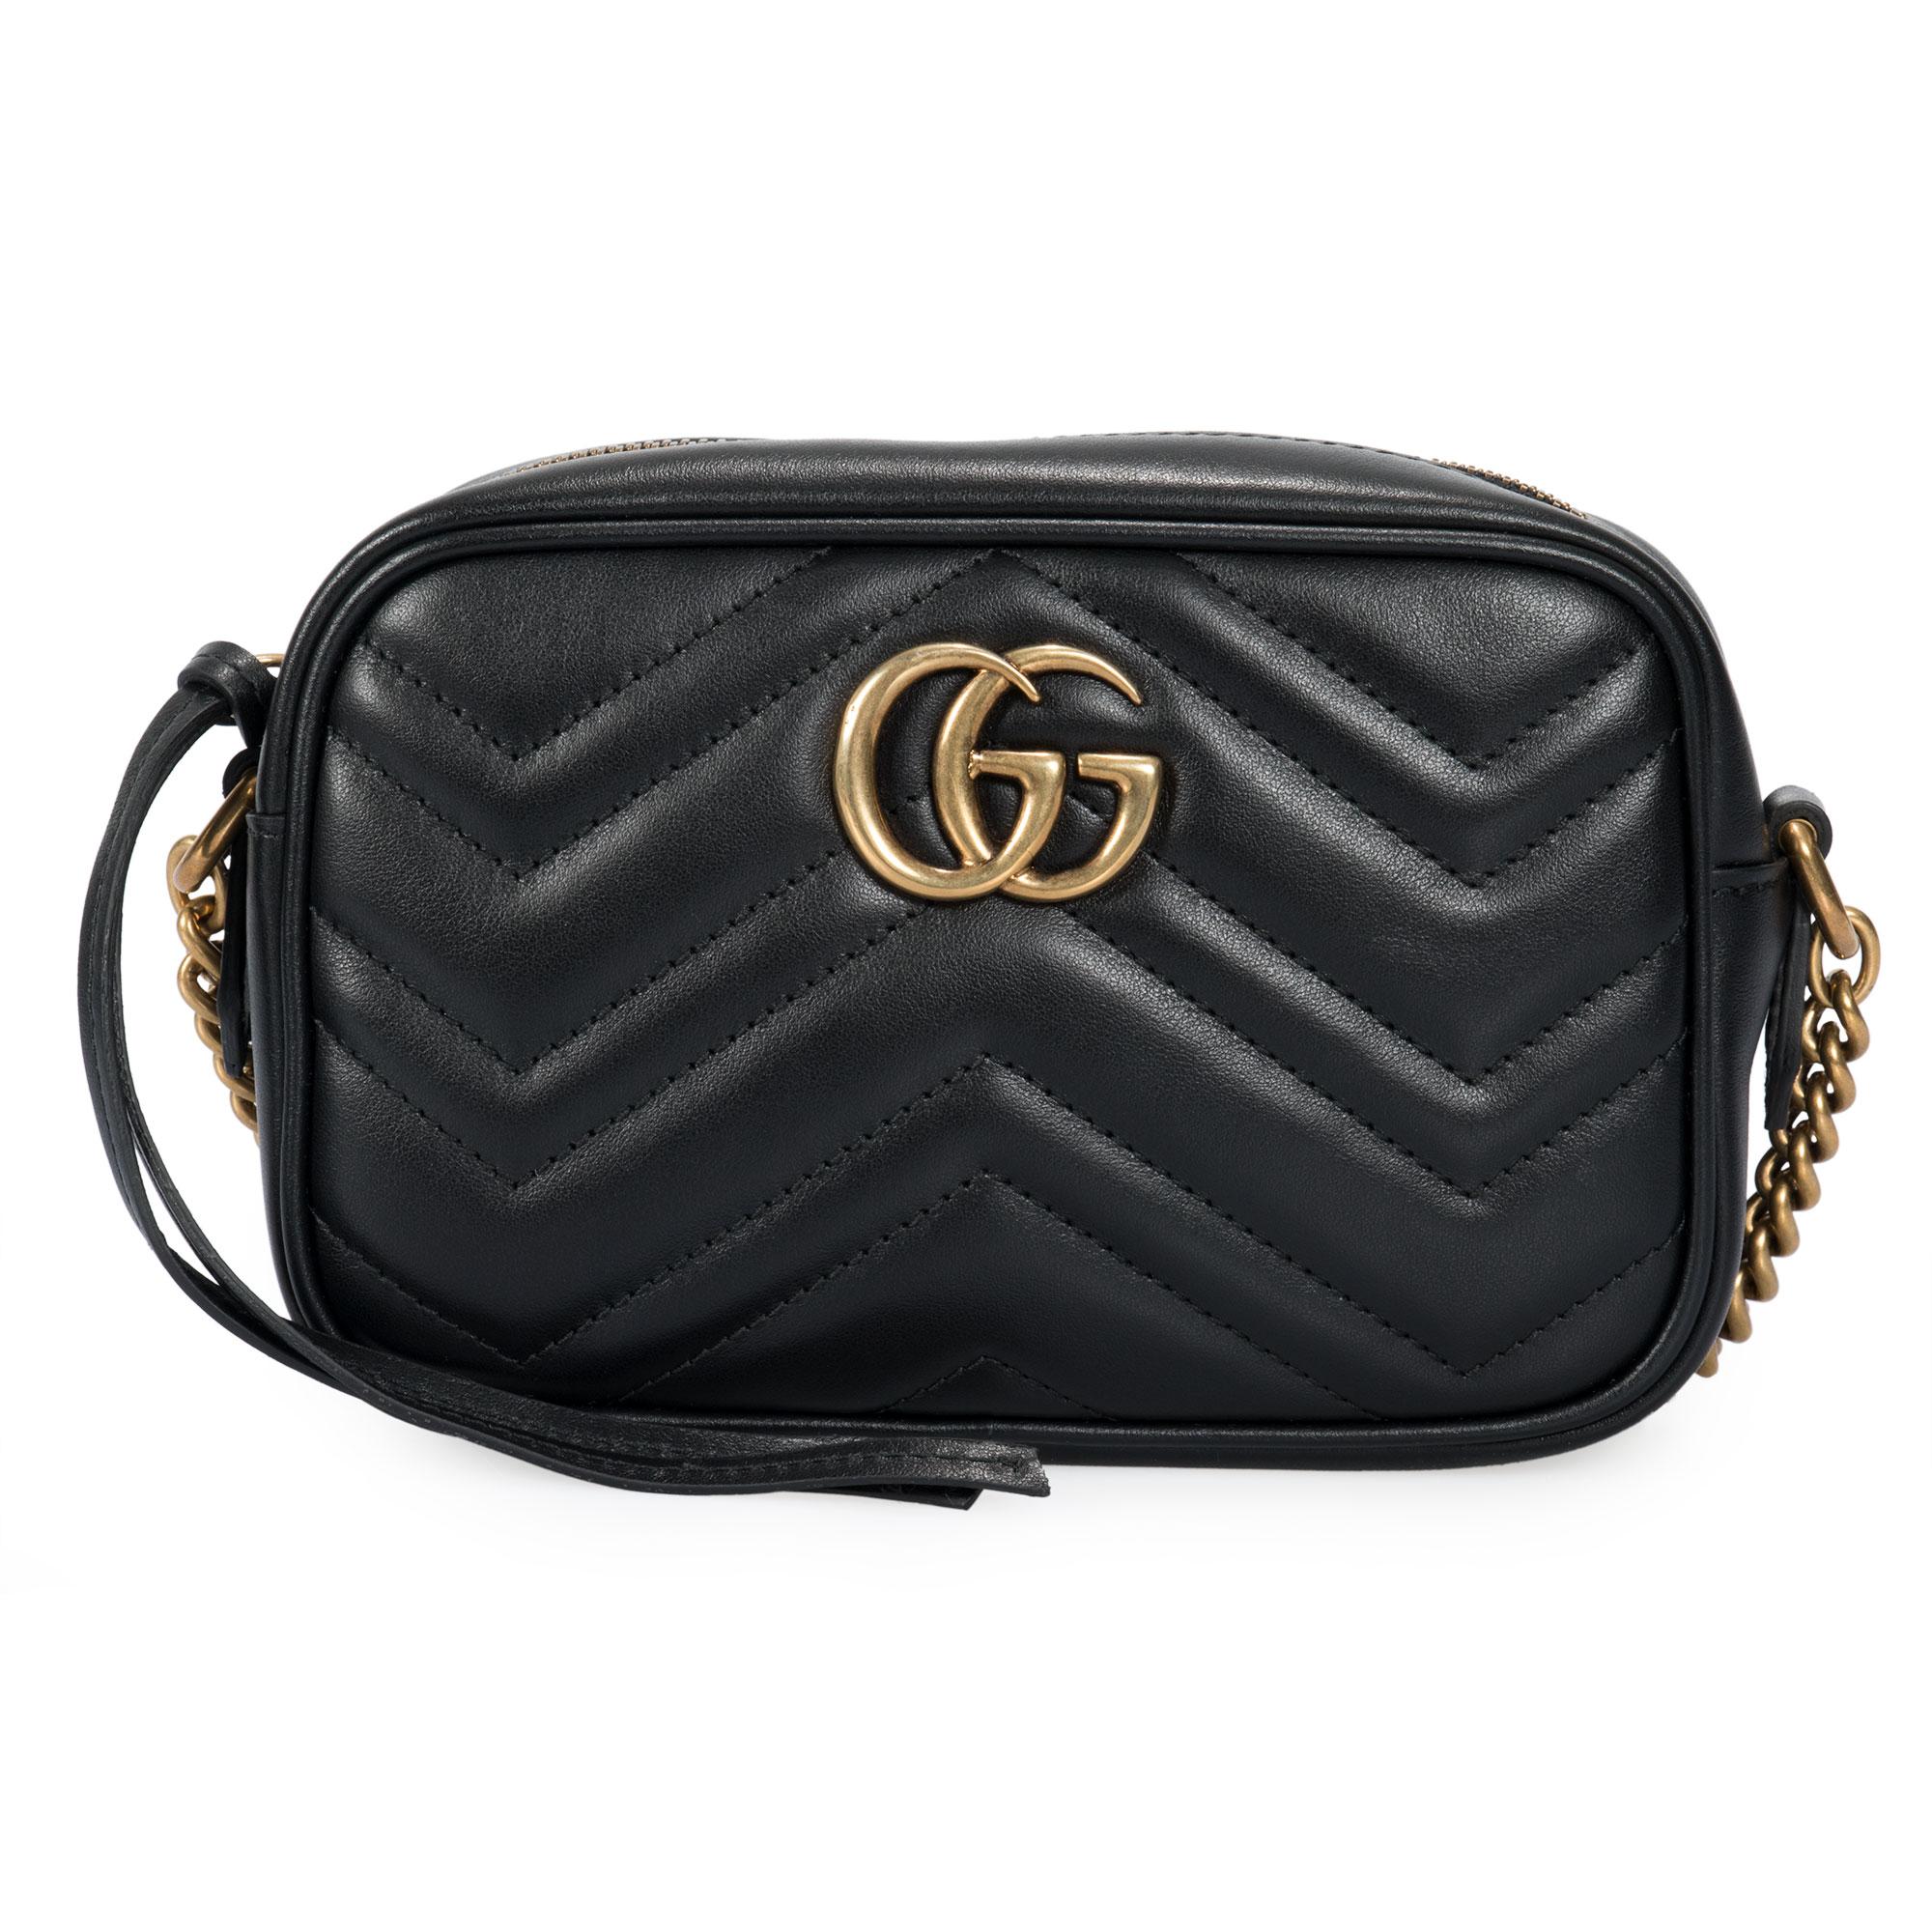 54b99c2d942 Gucci GG Marmont Matelasse Mini Shoulder Bag 727371138209